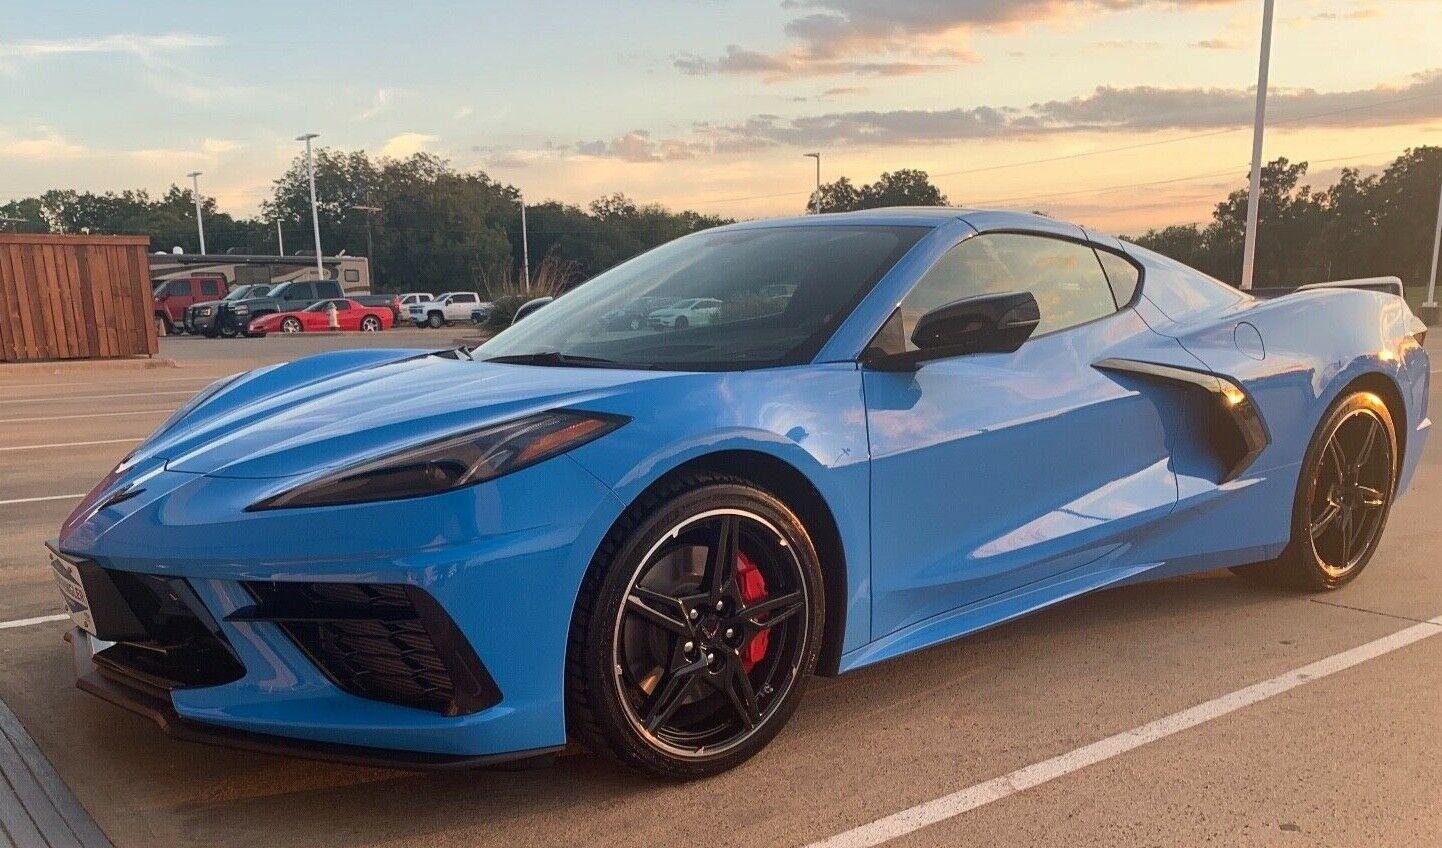 2020 Rapid Blue Chevrolet Corvette   | C7 Corvette Photo 1